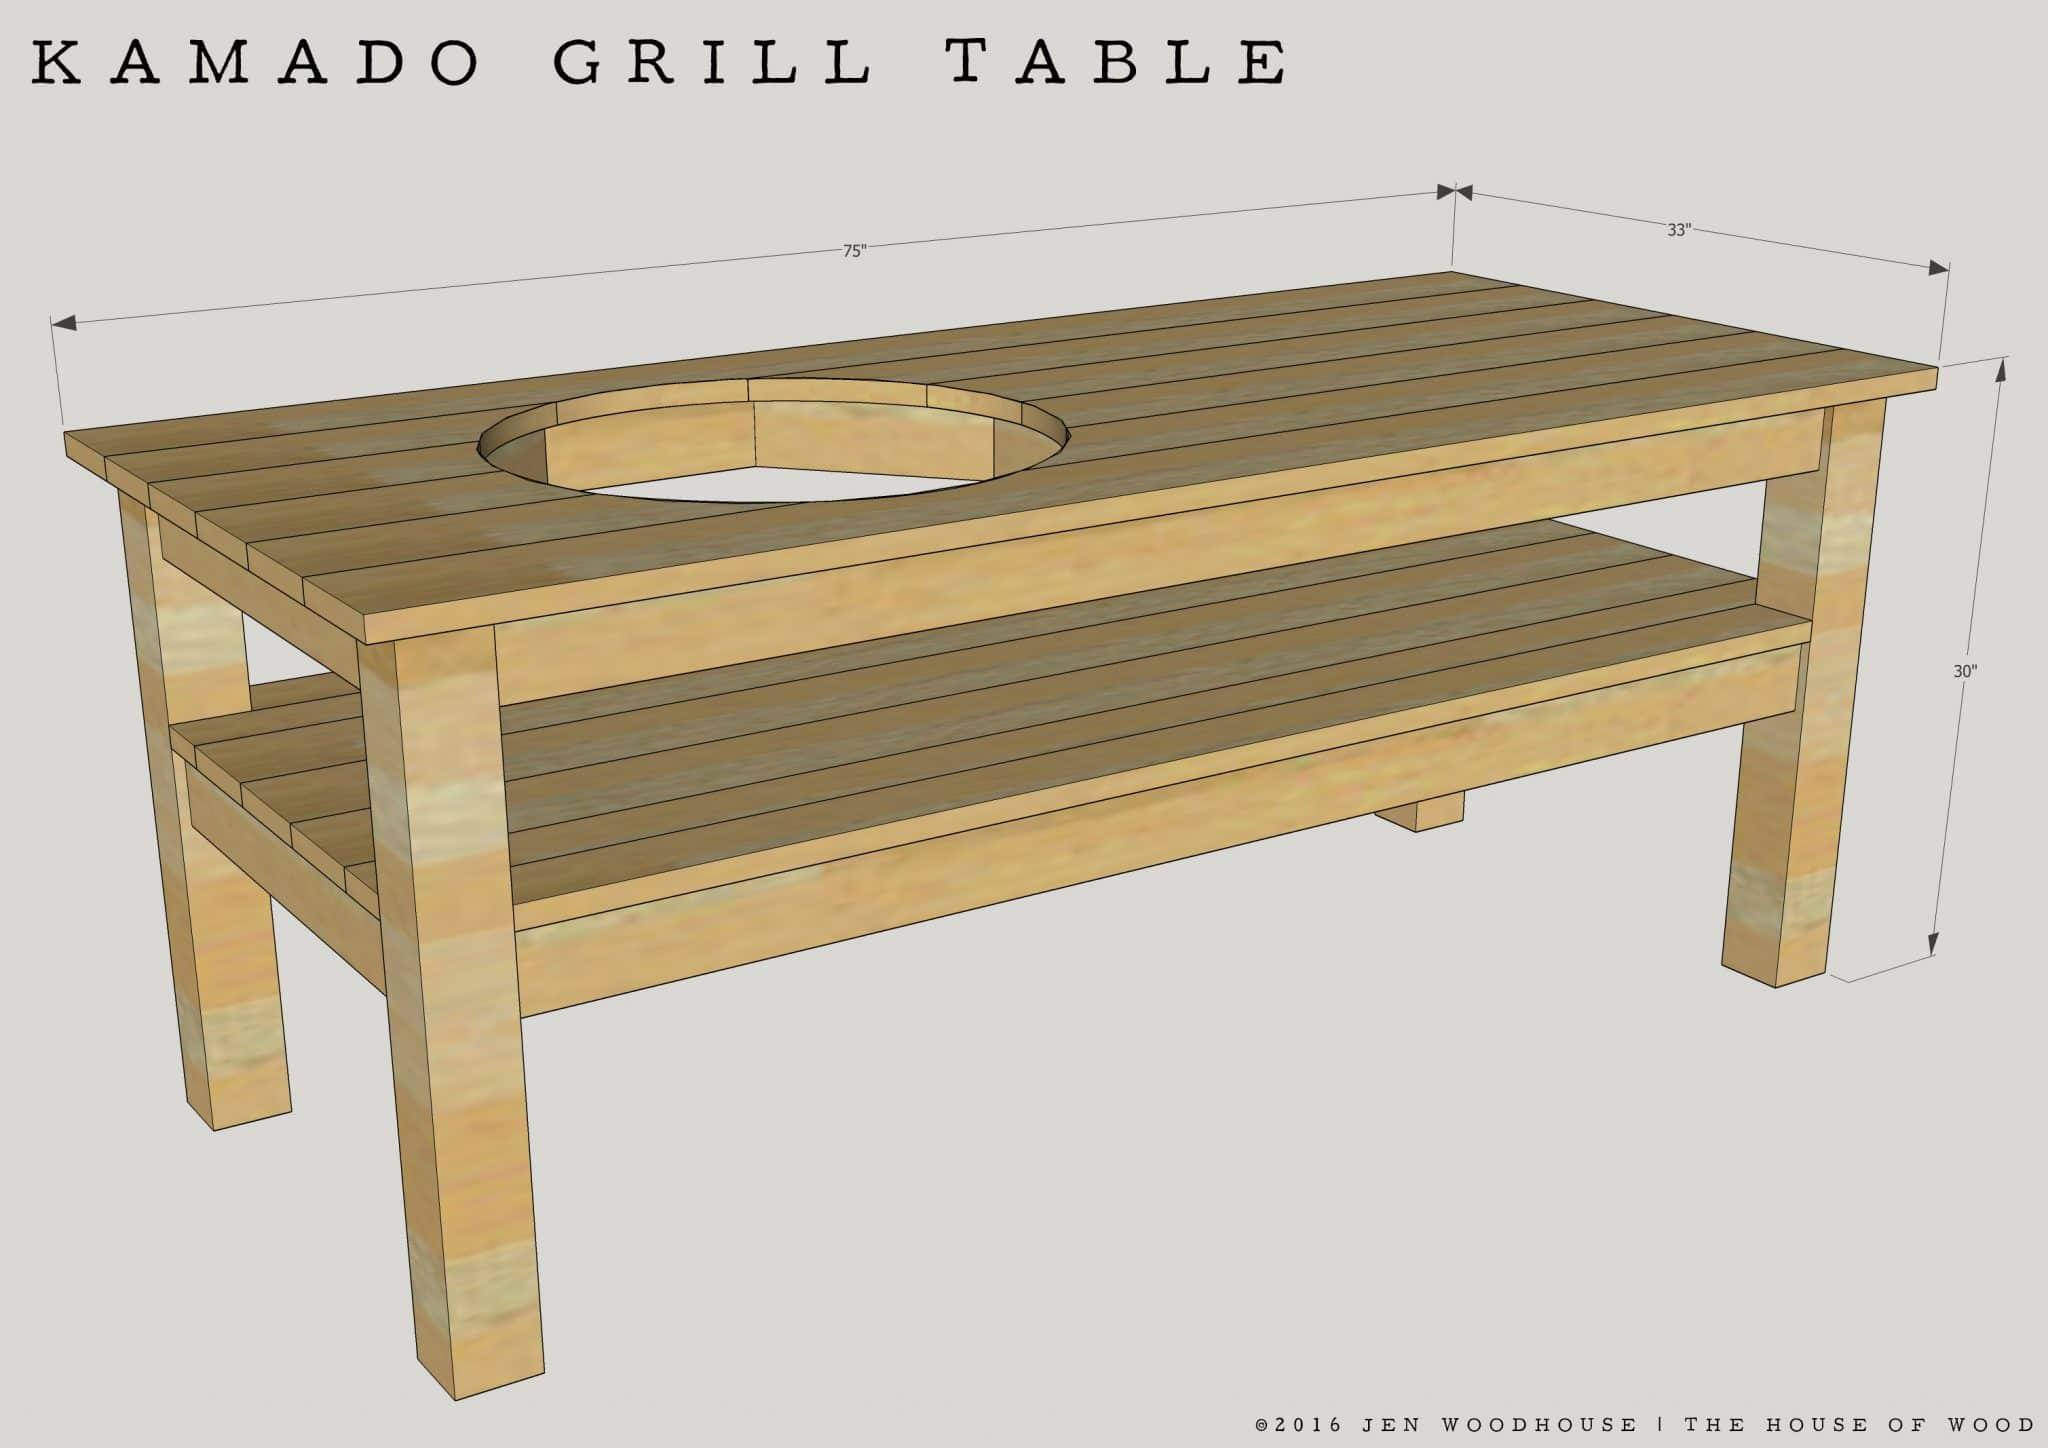 DIY Kamado Grill Table